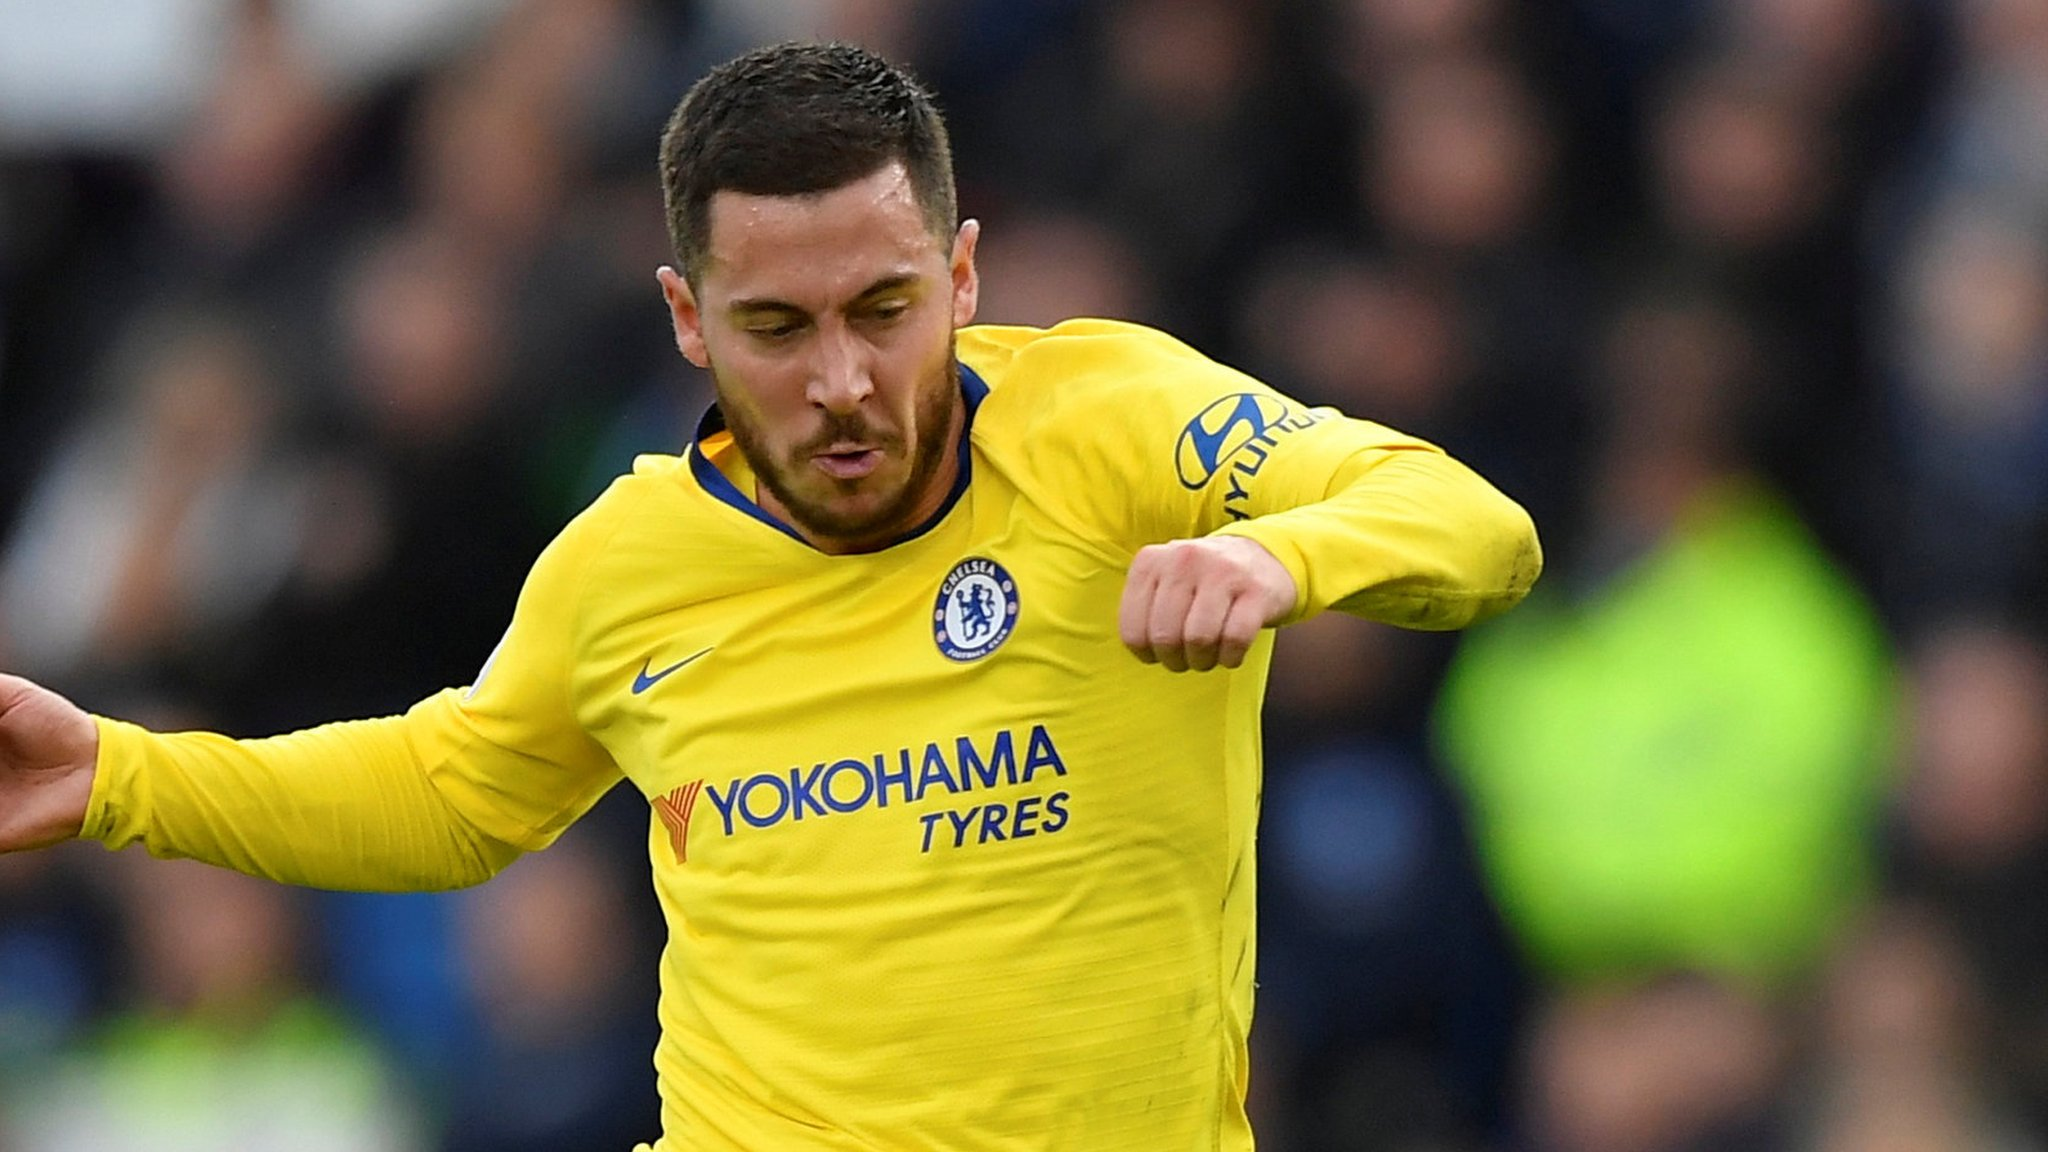 Premier League stats: Is Eden Hazard having a deceptively good season for Chelsea?